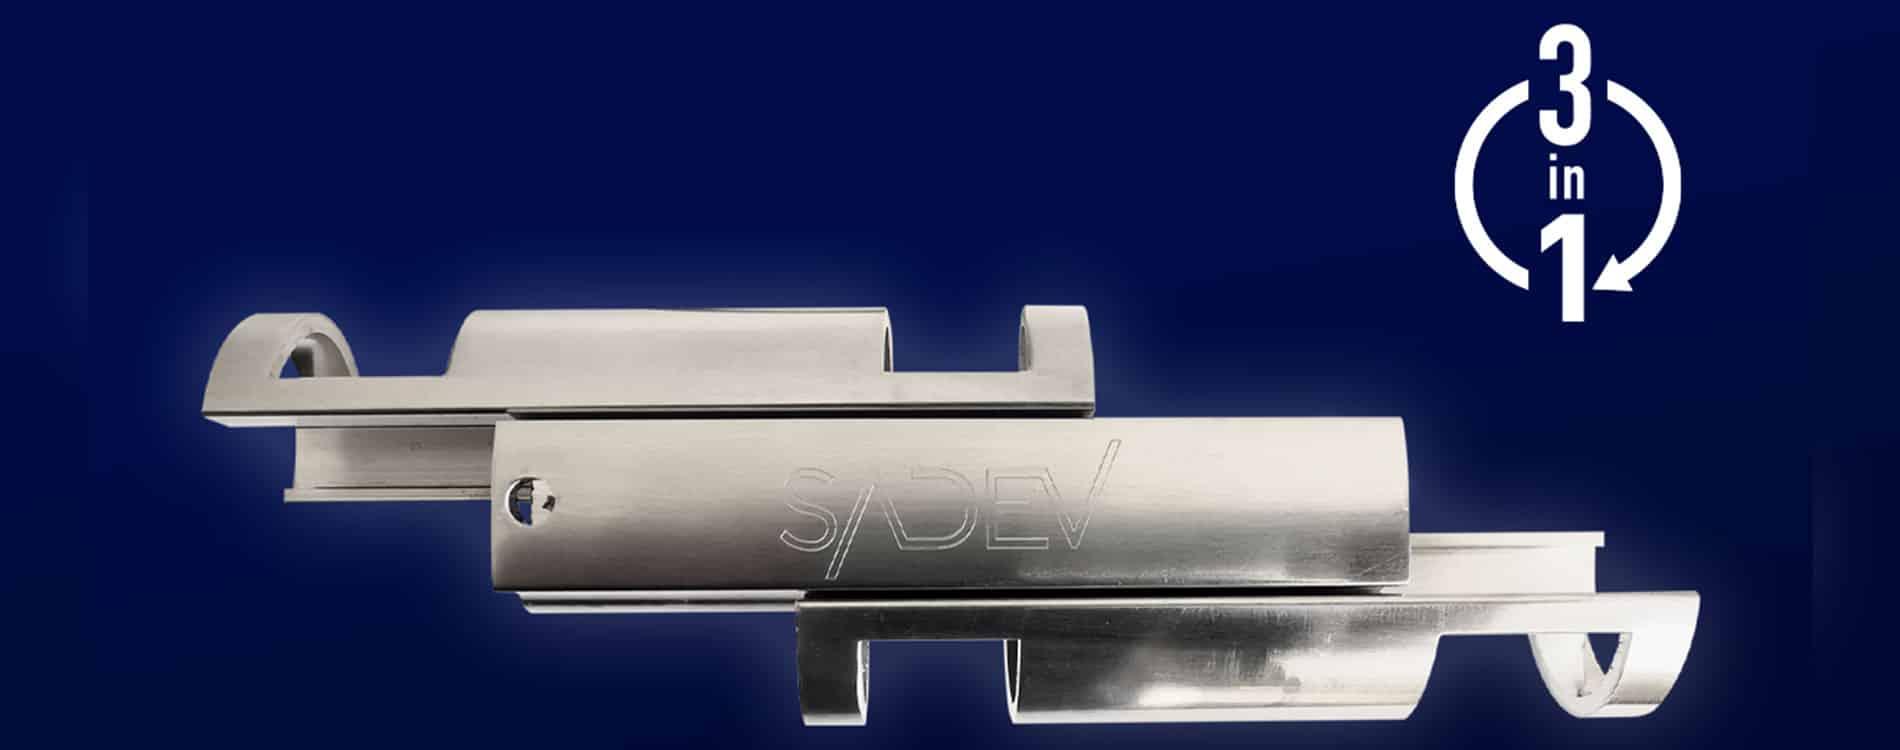 en sabco glass balustrade garde corps verre one side2.0. tooljpg